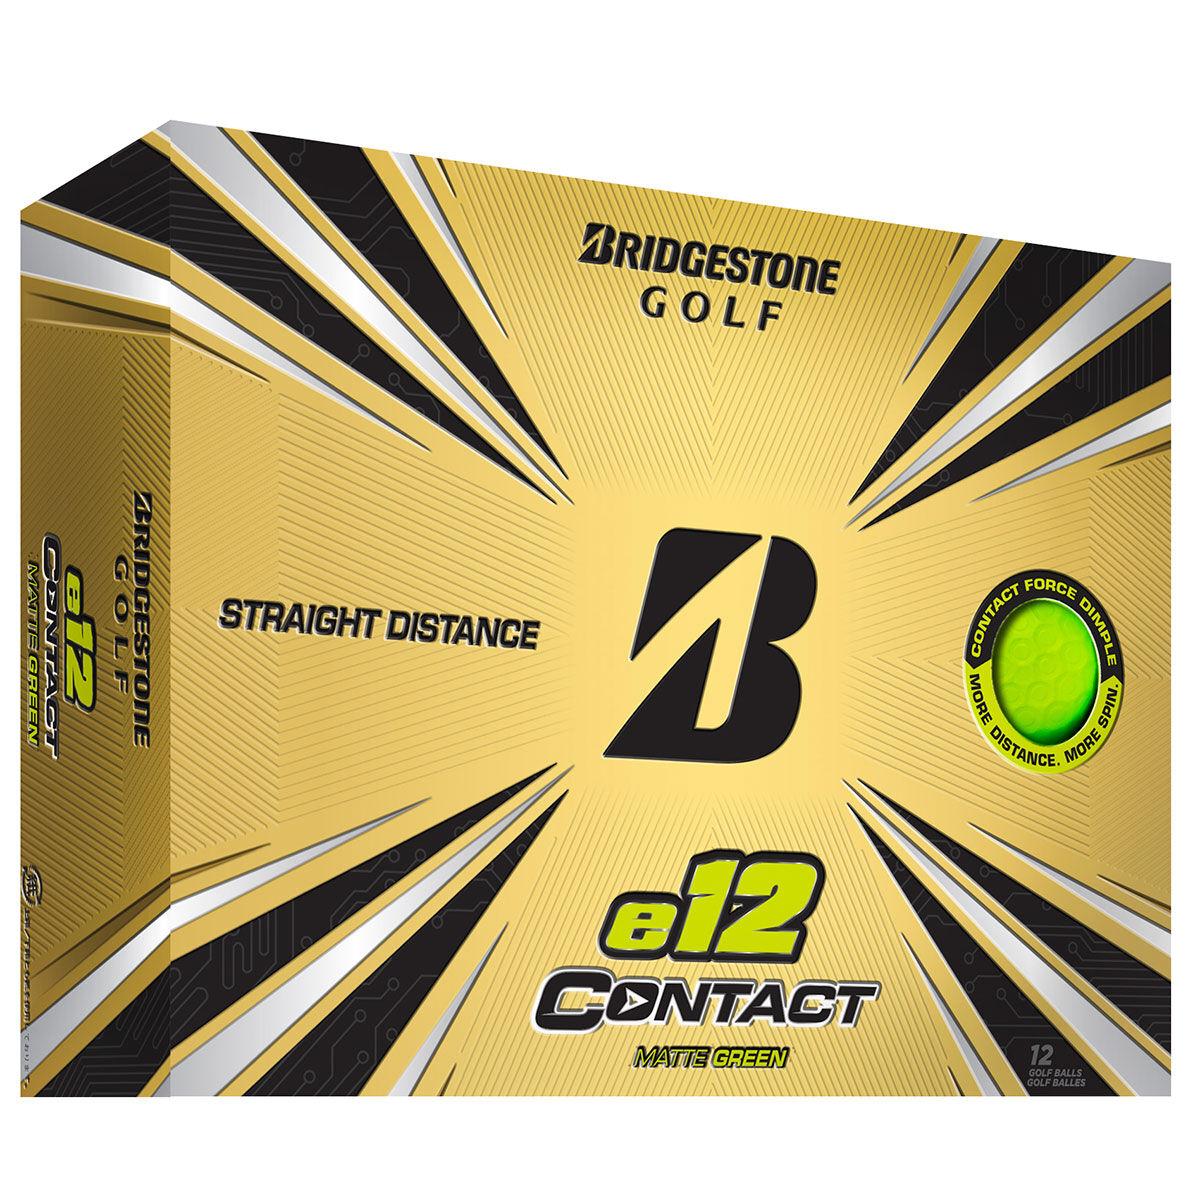 Bridgestone Golf e12 CONTACT 12 Ball Pack, Male, Green | American Golf